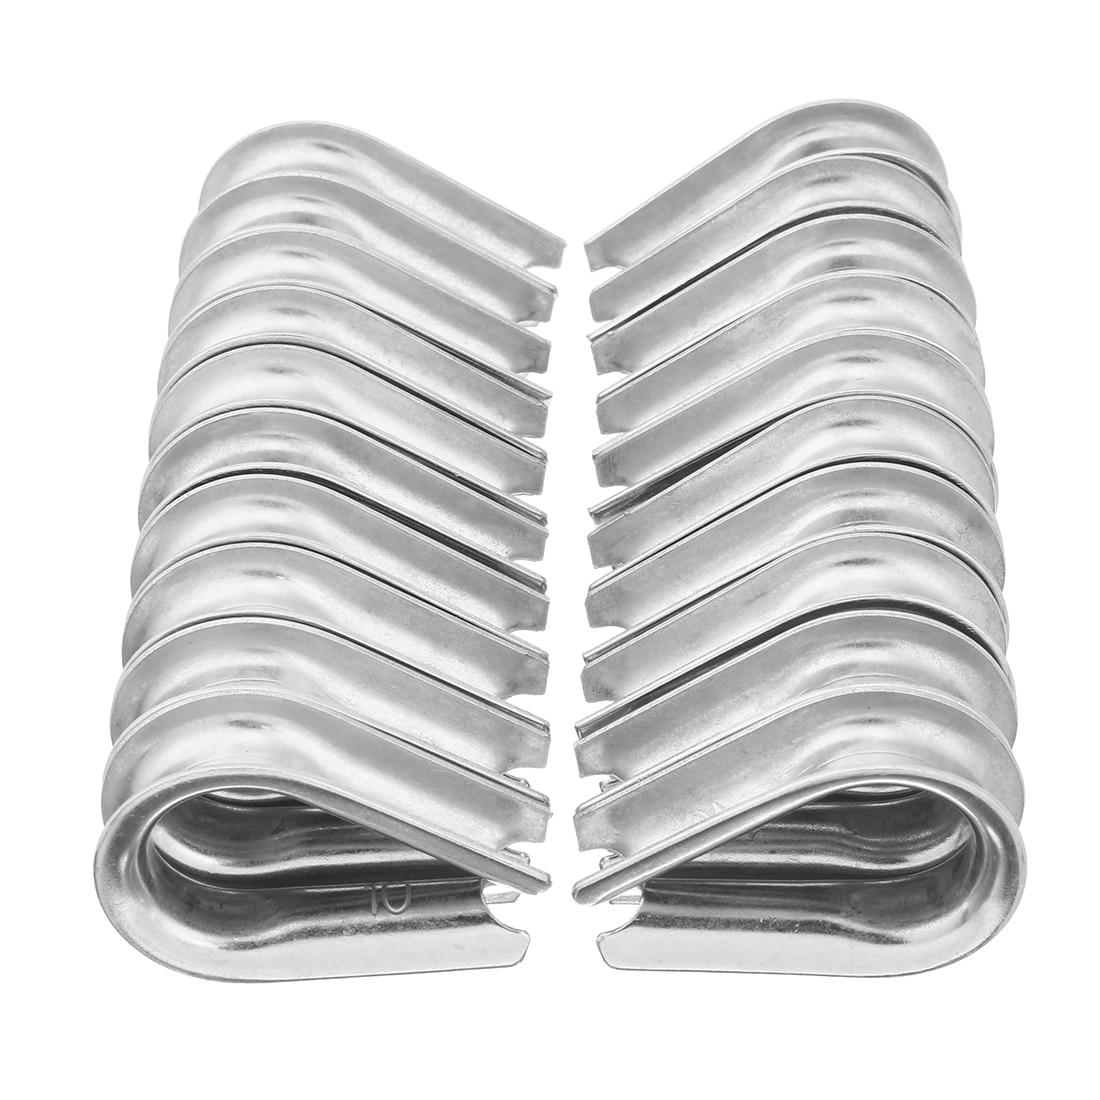 Нержавеющая сталь uxcell наперсток для 0,39 дюйма (10 мм) Диаметр троса 20 шт